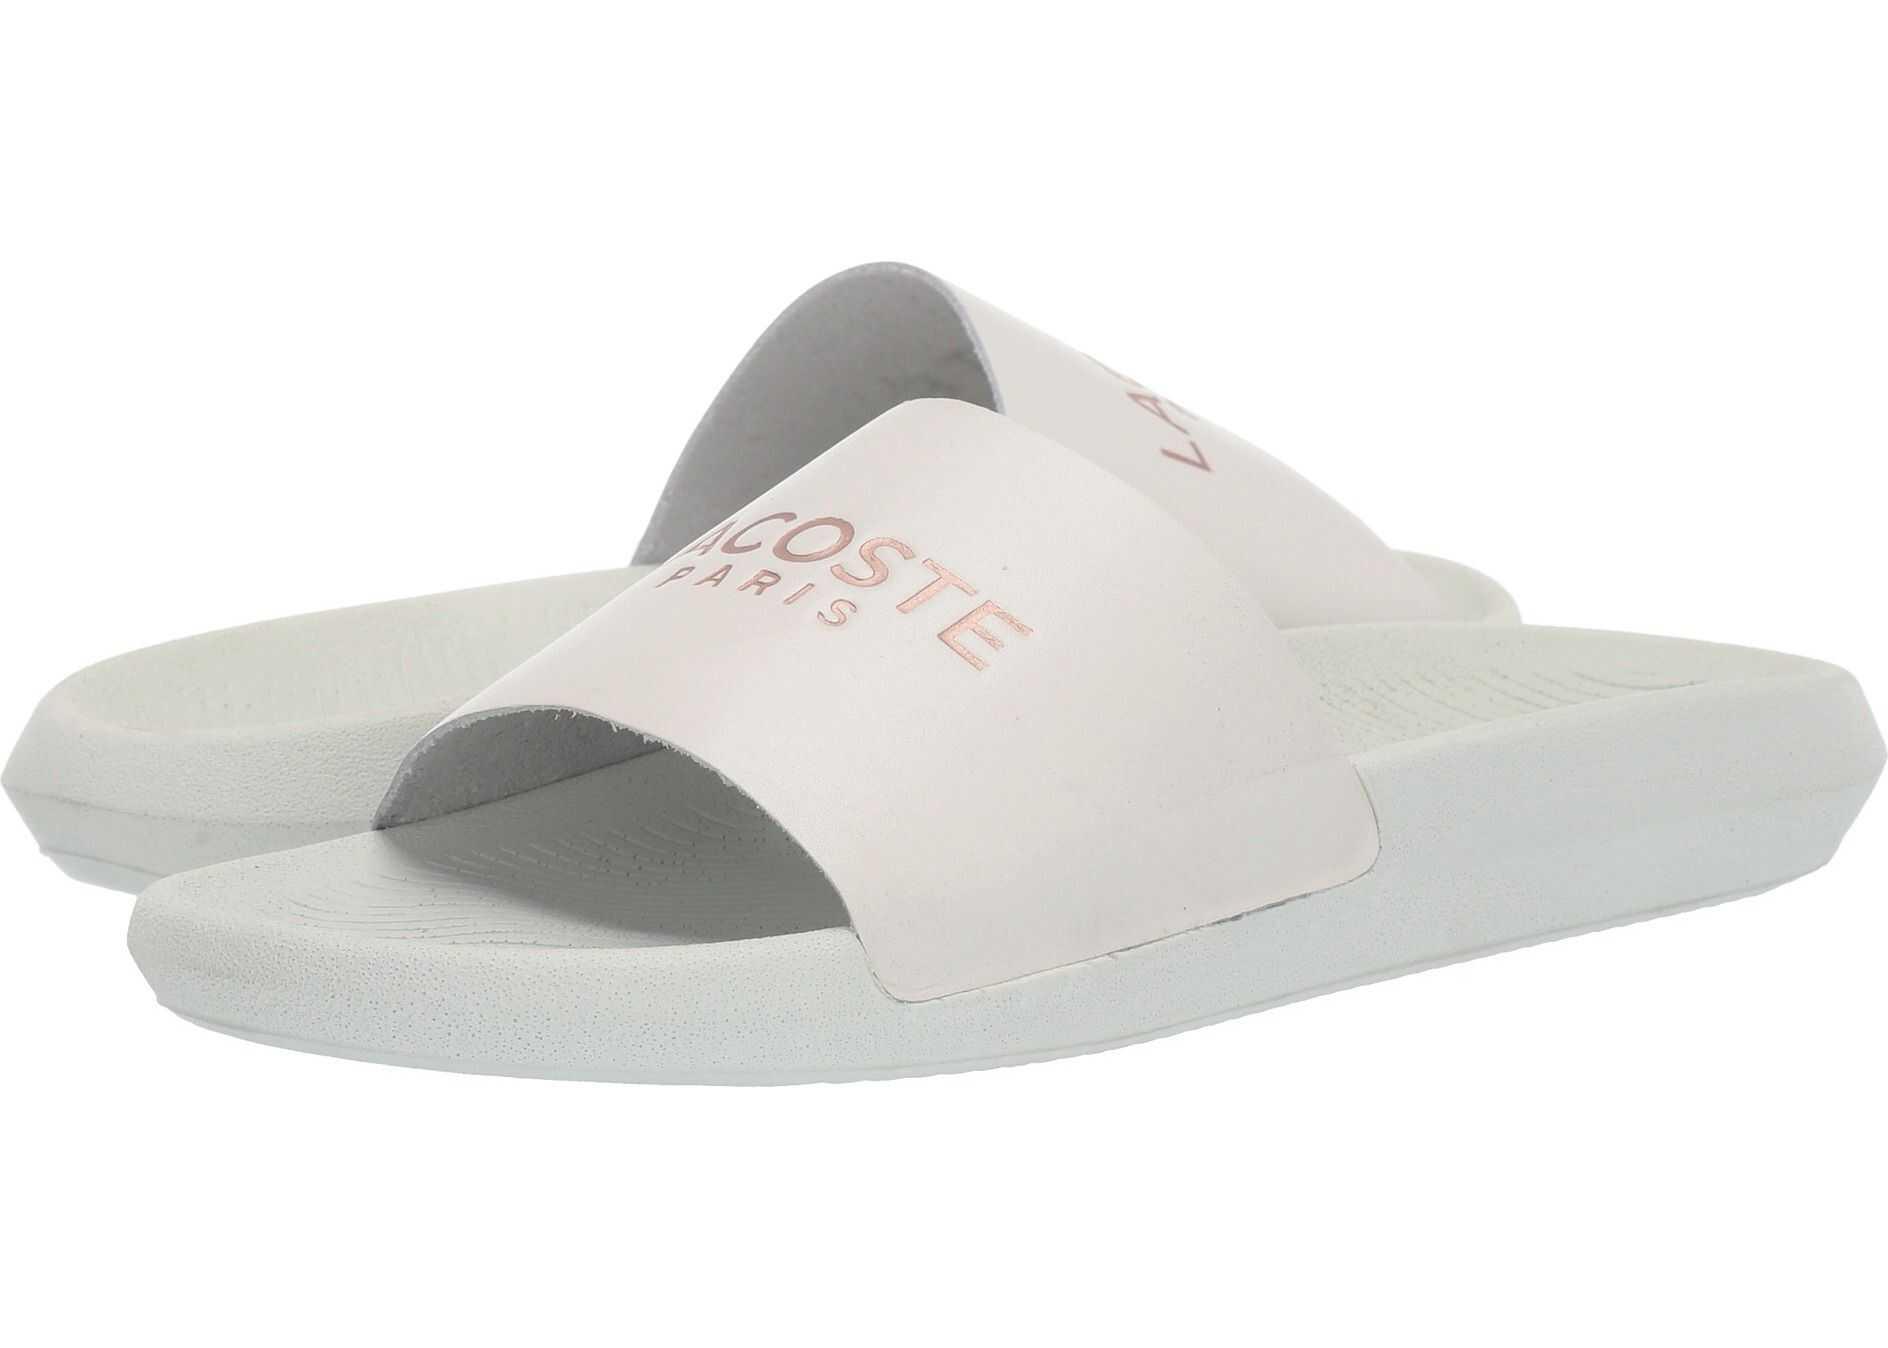 Lacoste Croco Slide 119 2 Off-White/Pink